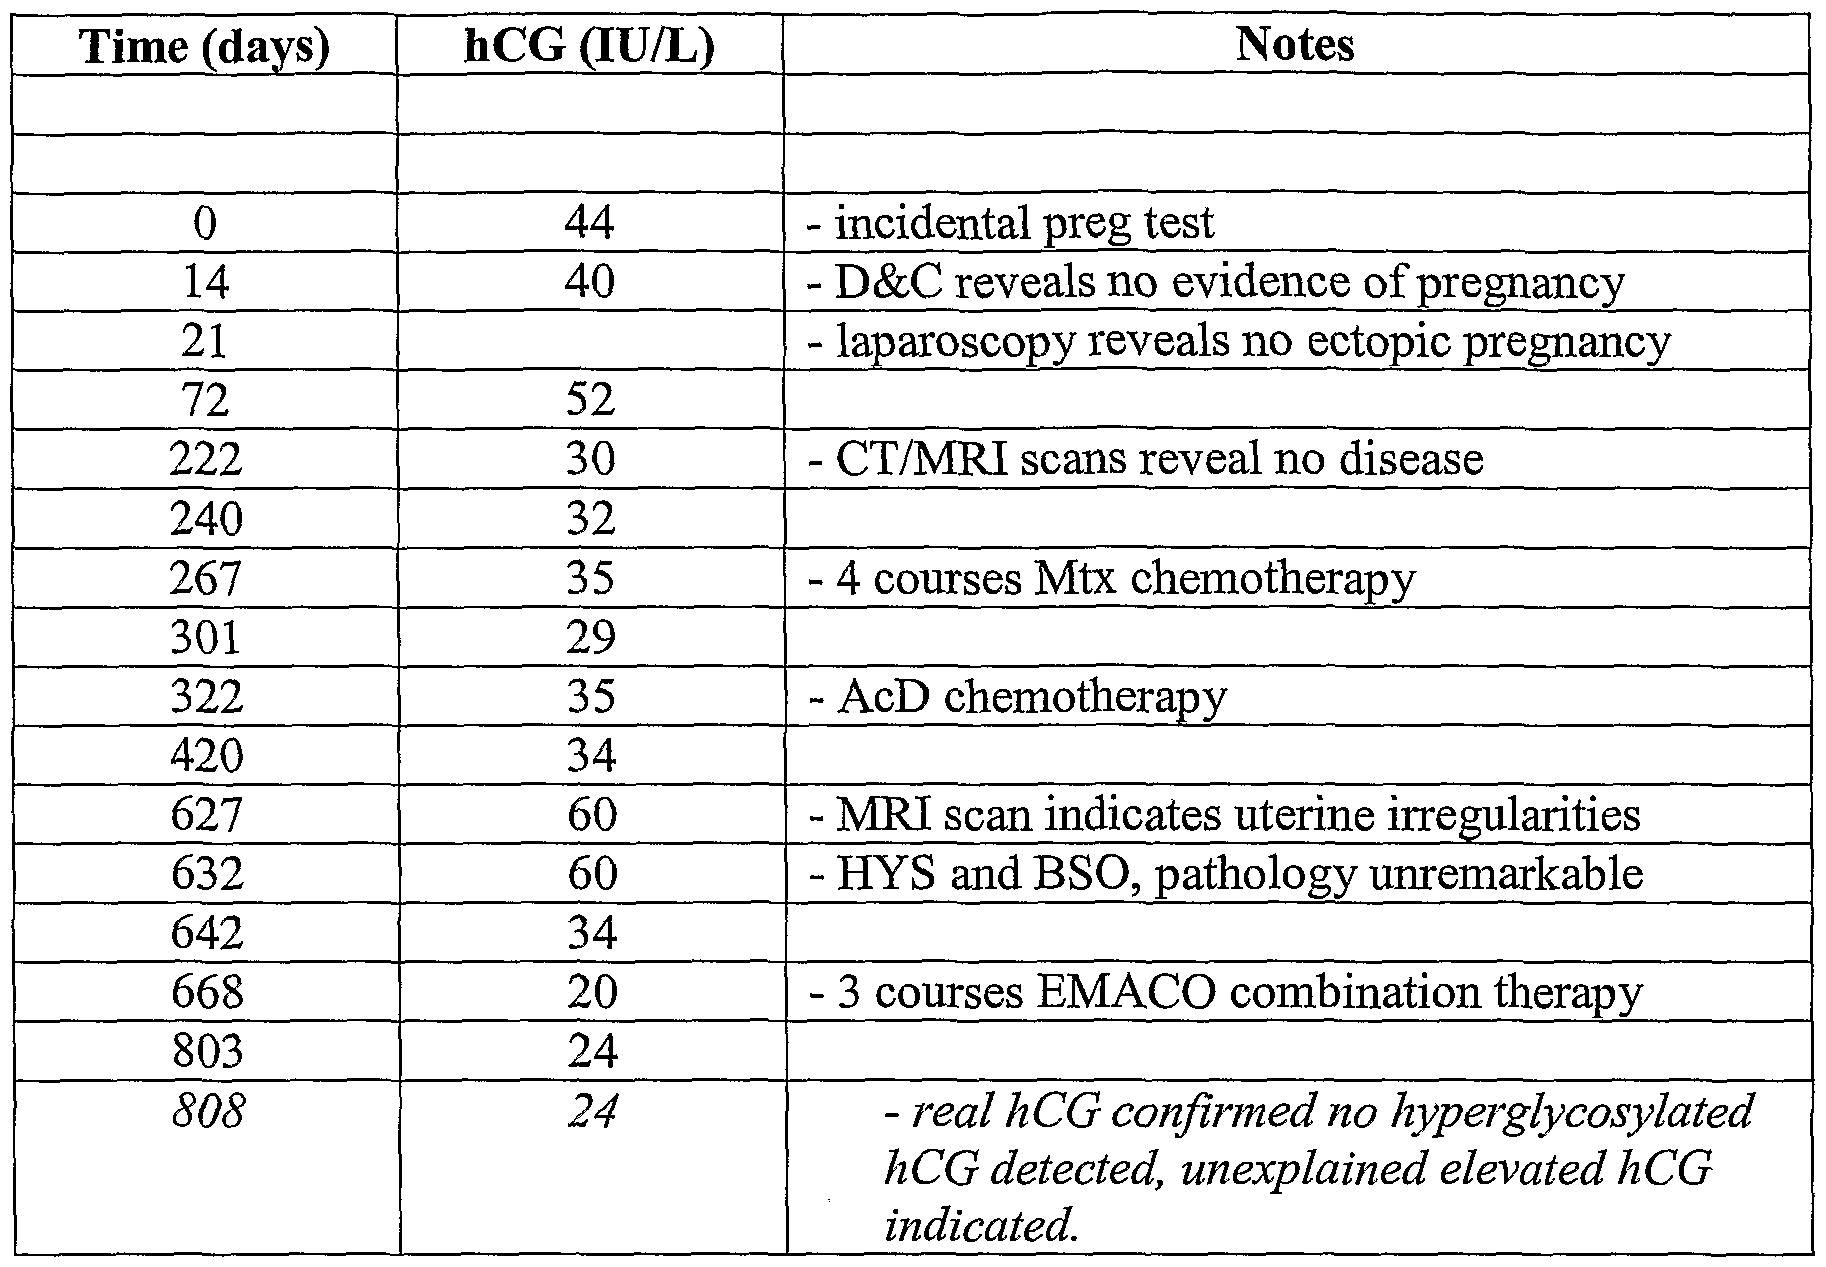 WO2004033626A2 - Hyperglycosylated hcg (invasive trophoblast